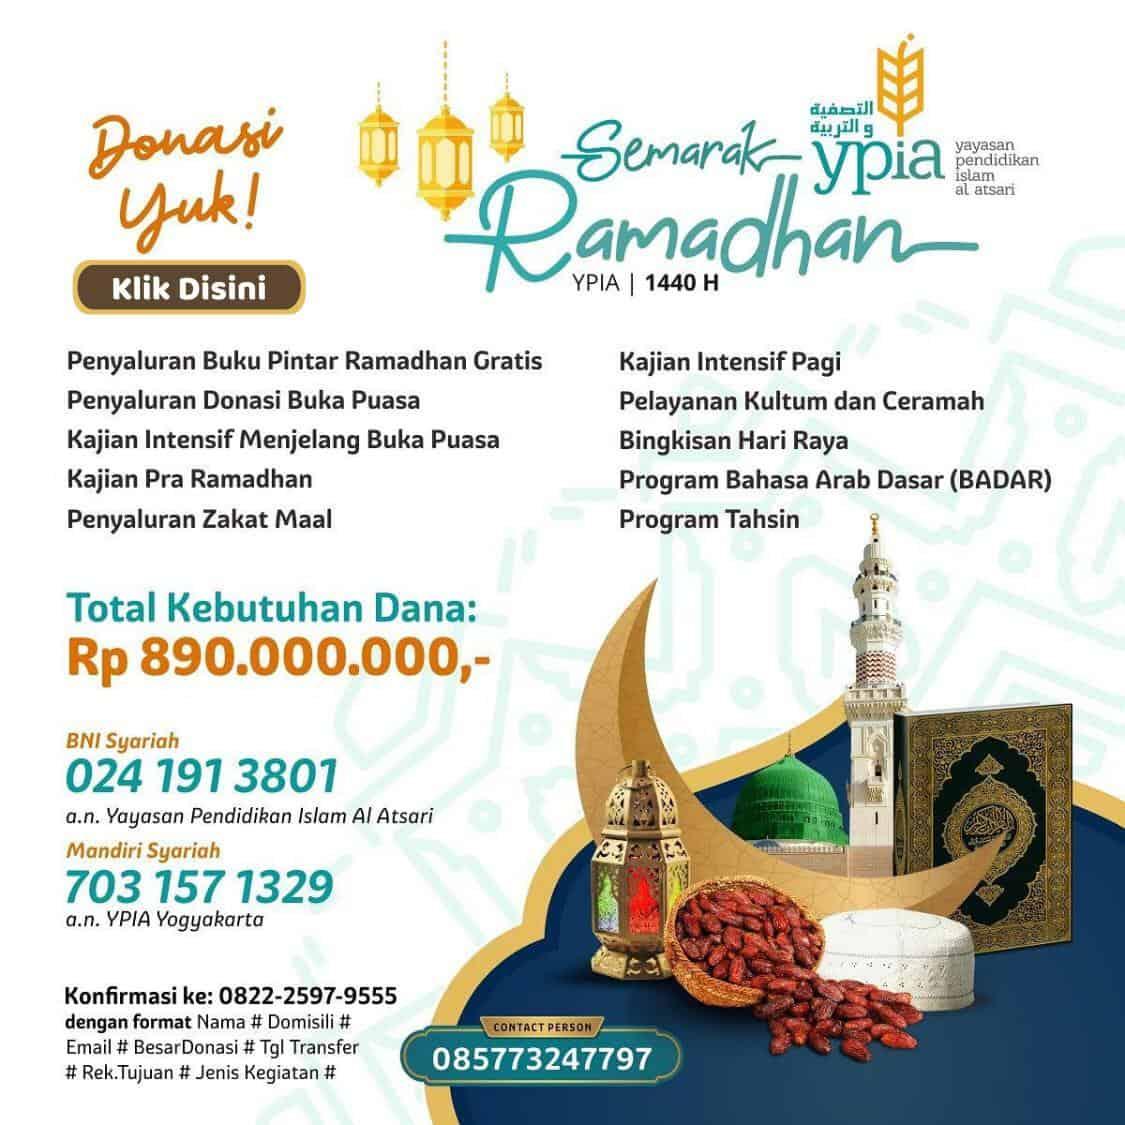 donasi ramadhan ypia